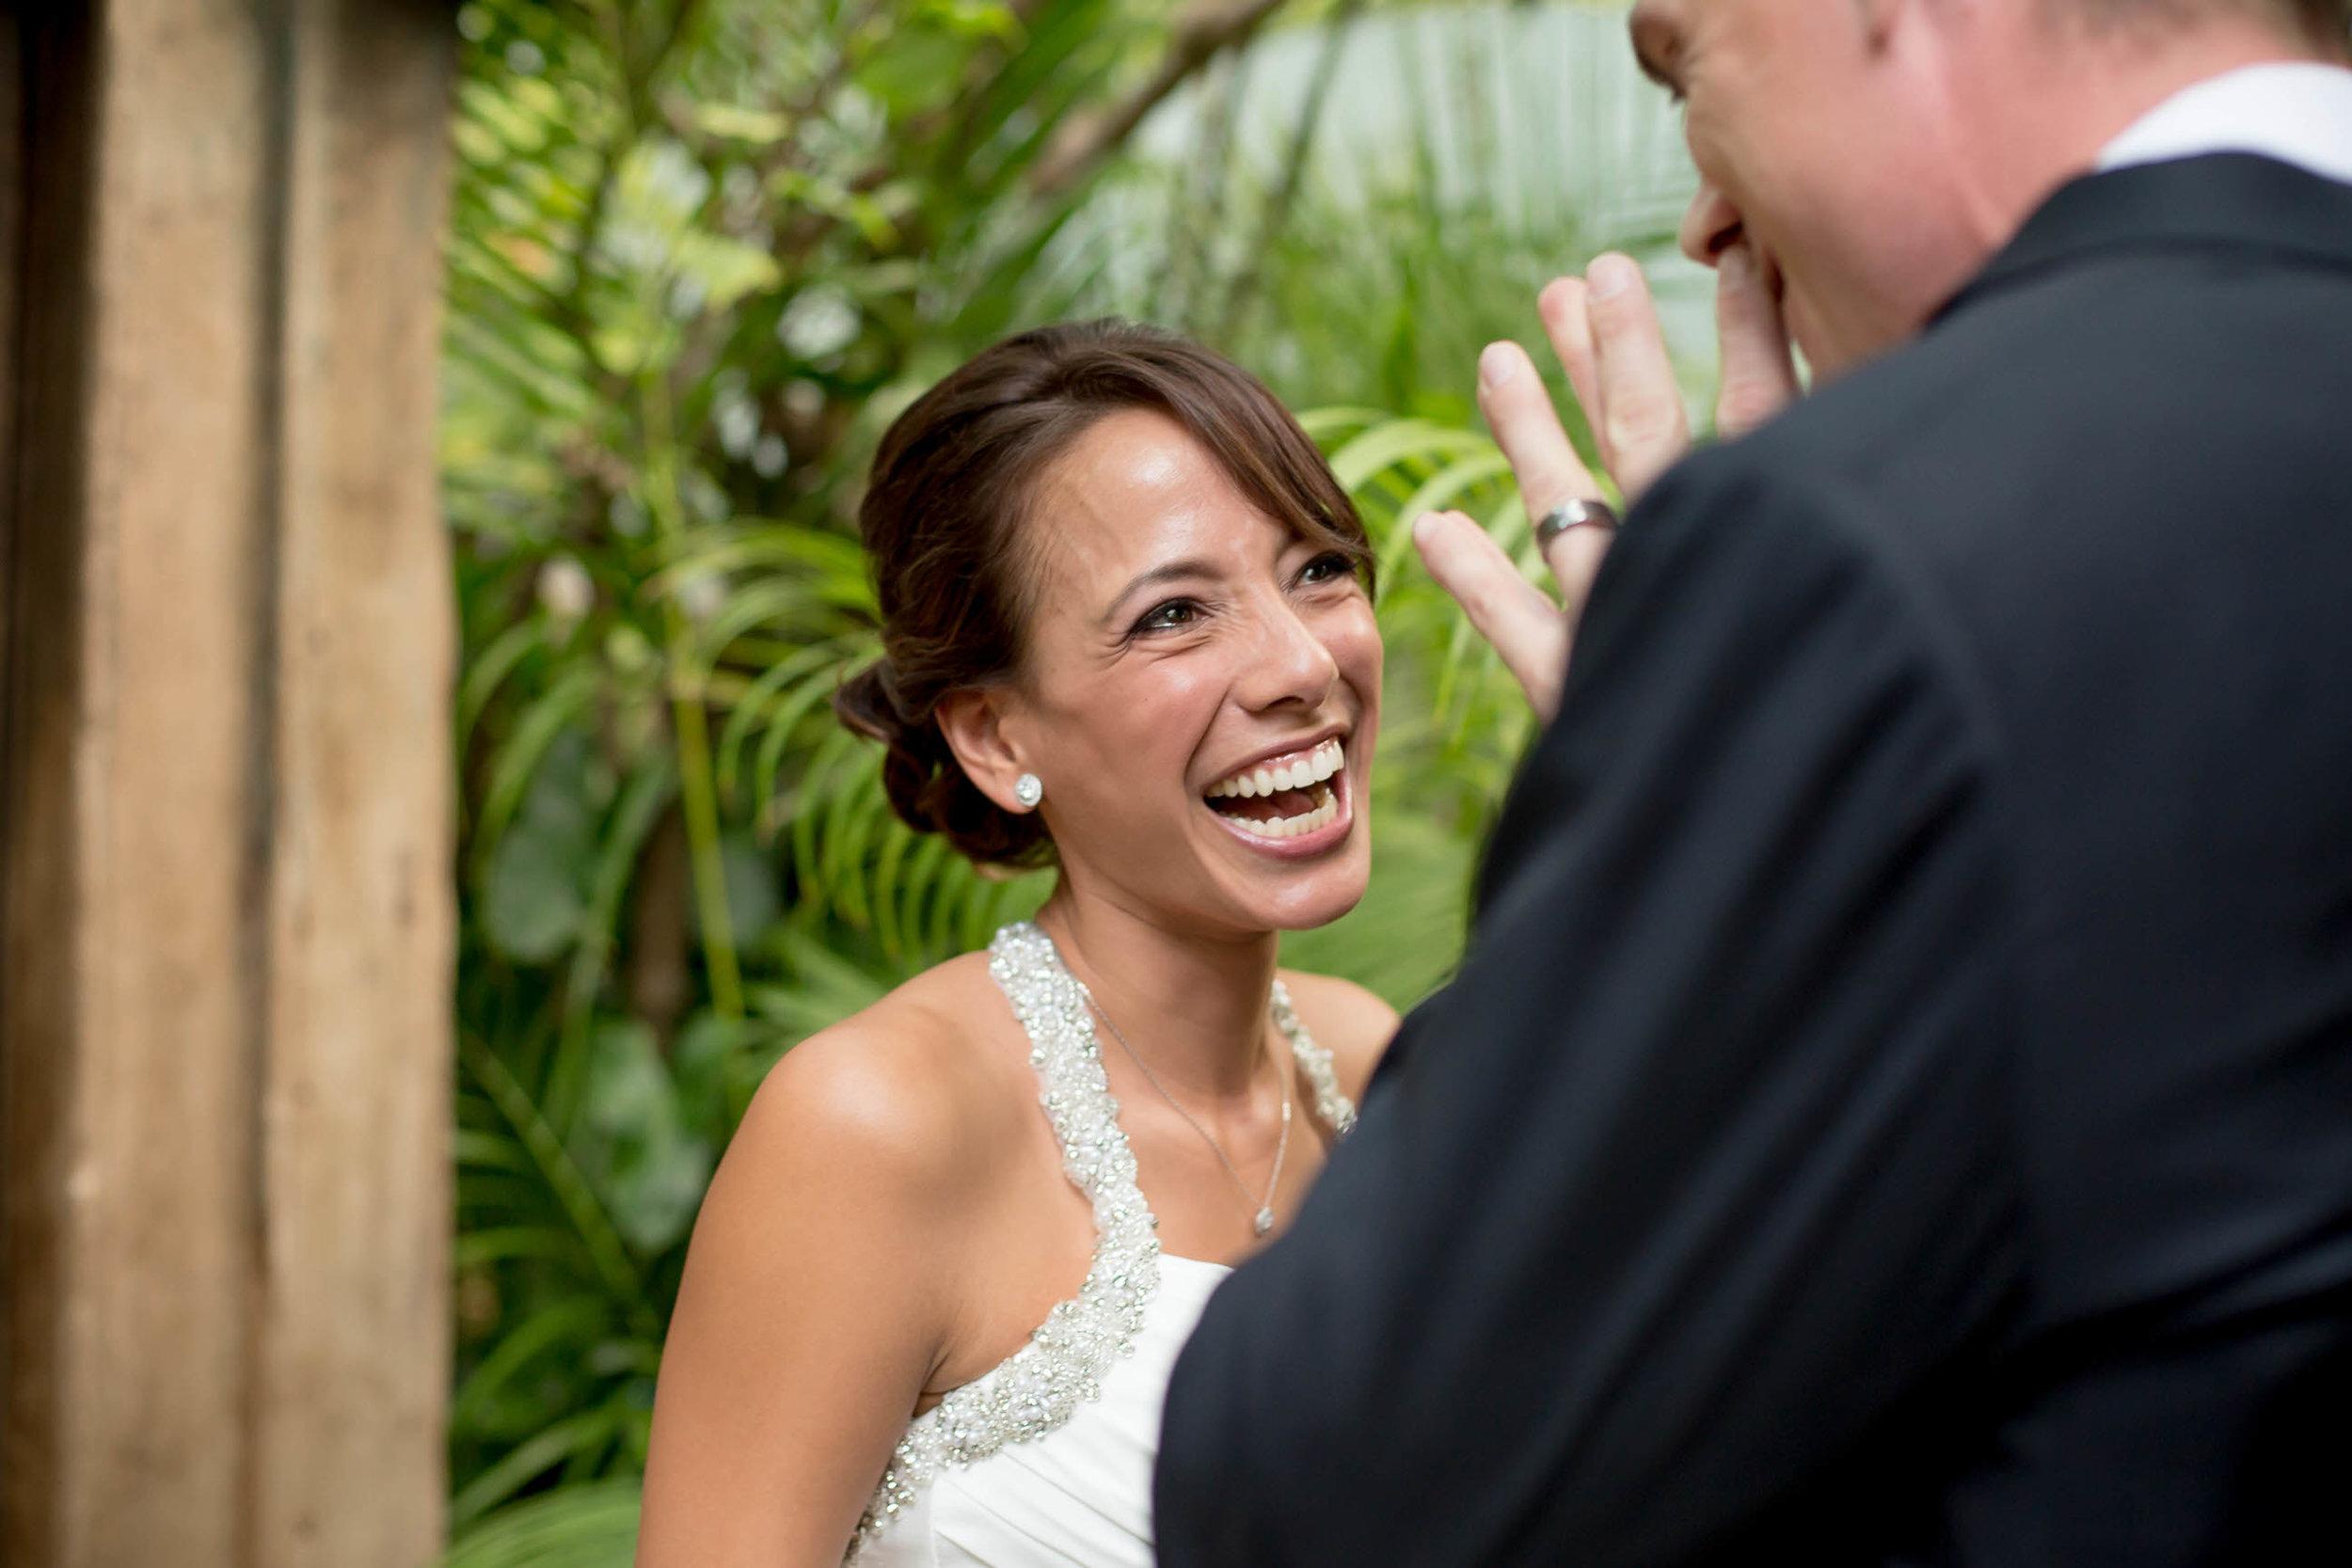 bride_emotional_happy_moments_tiny_house_photo.jpg